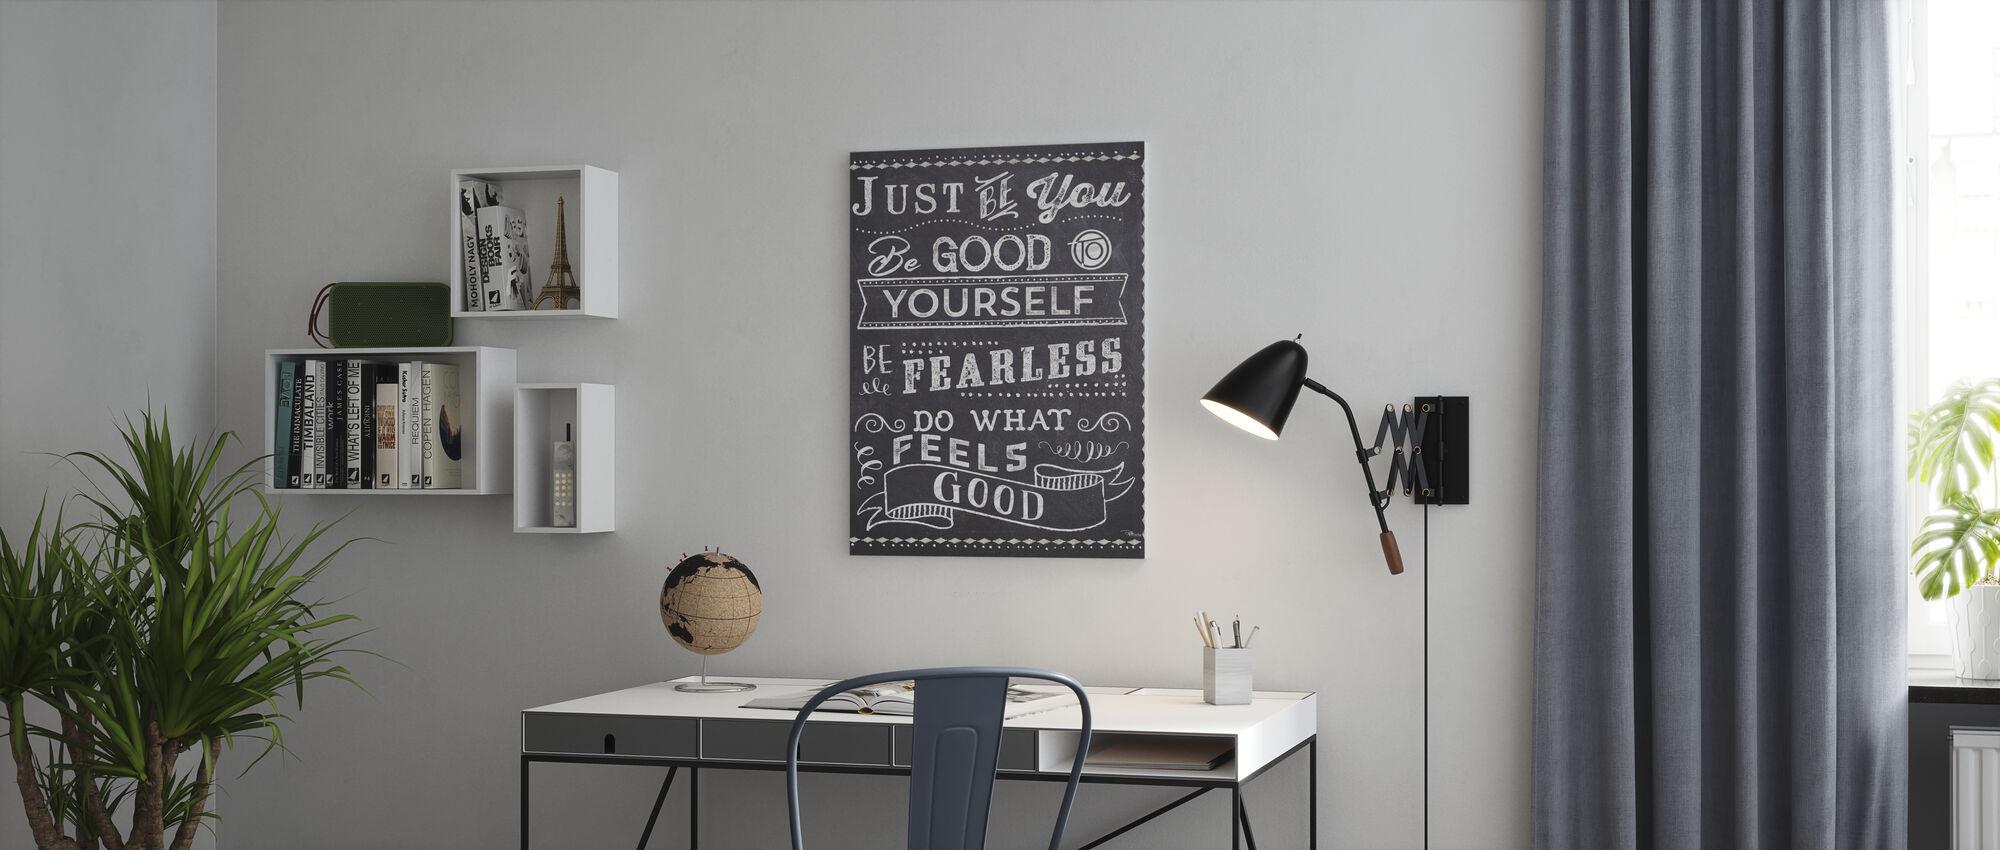 Sii solo tu II - Stampa su tela - Uffici